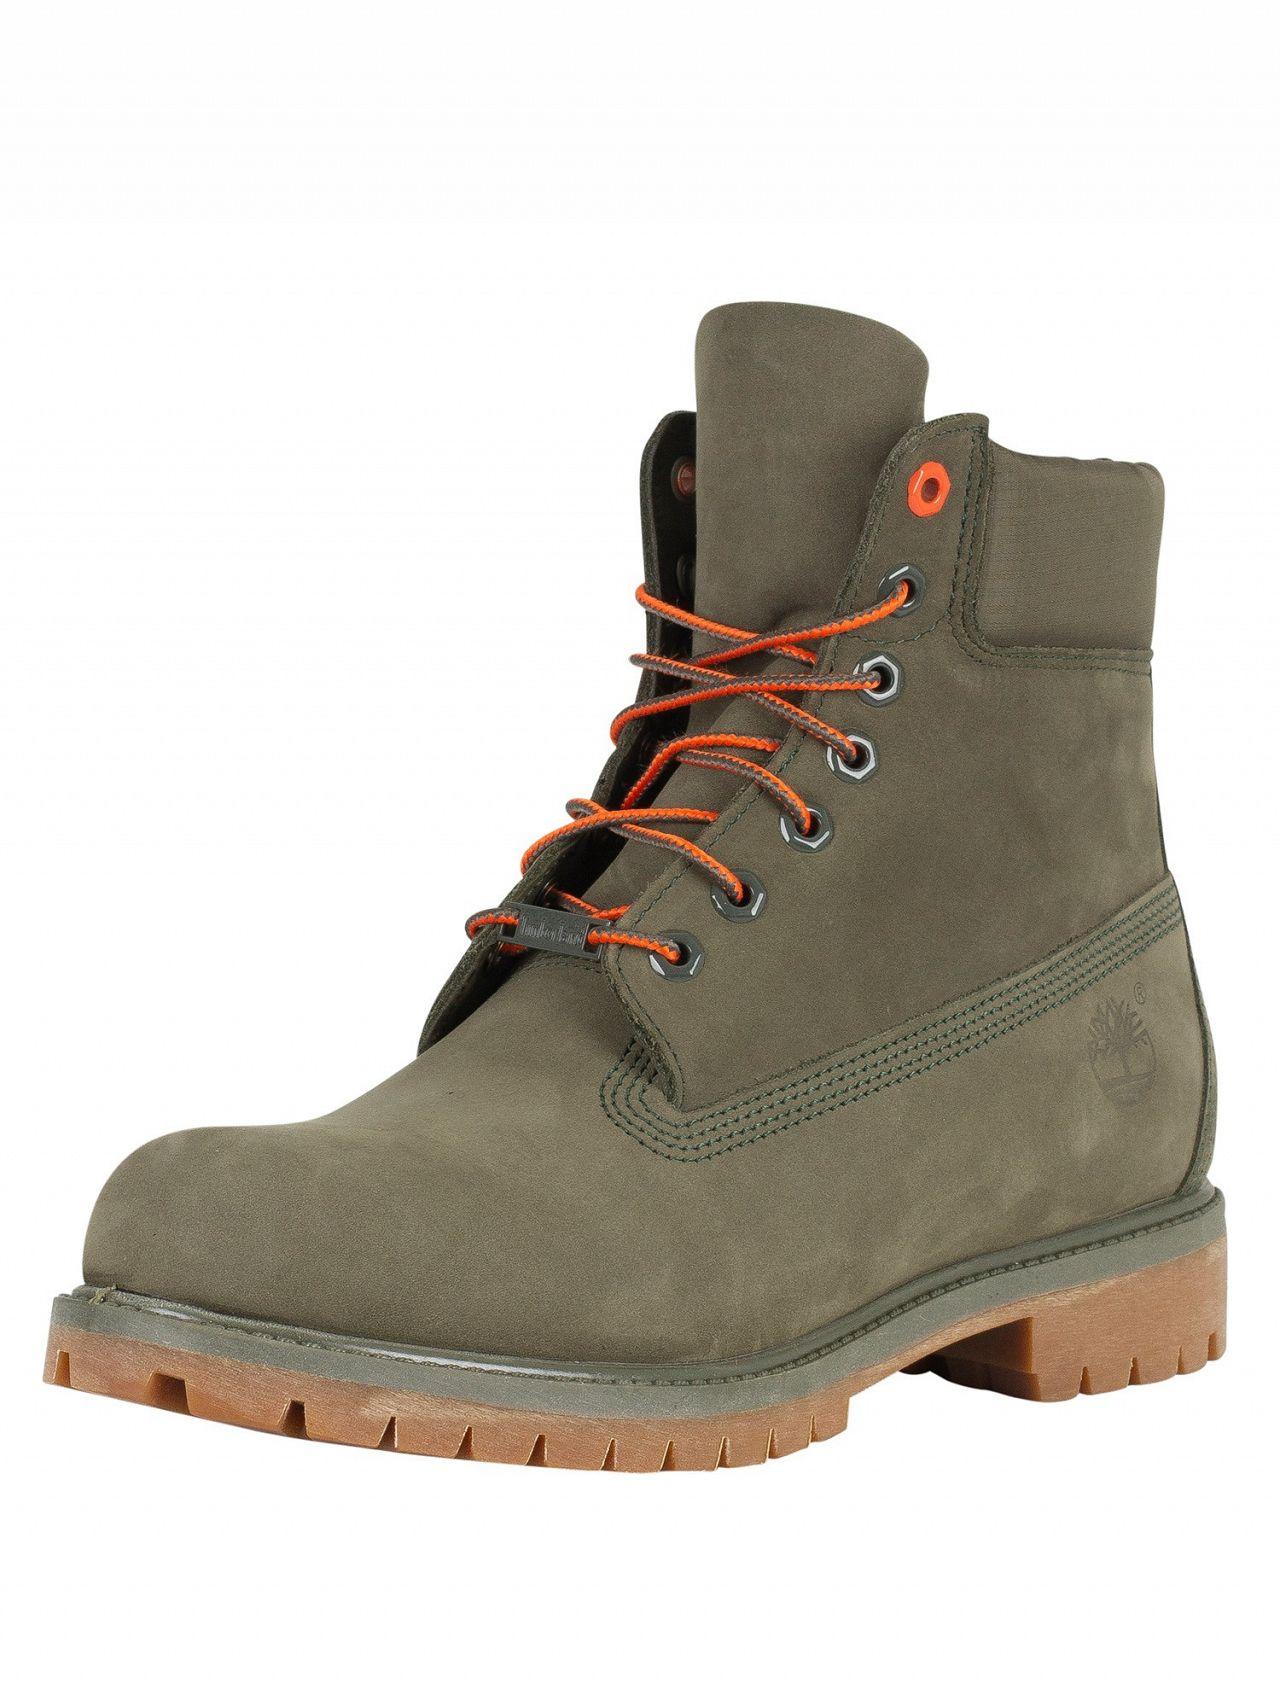 8df394735b Timberland Grape Leaf 6 Inch Premium Waterproof Boots   Standout